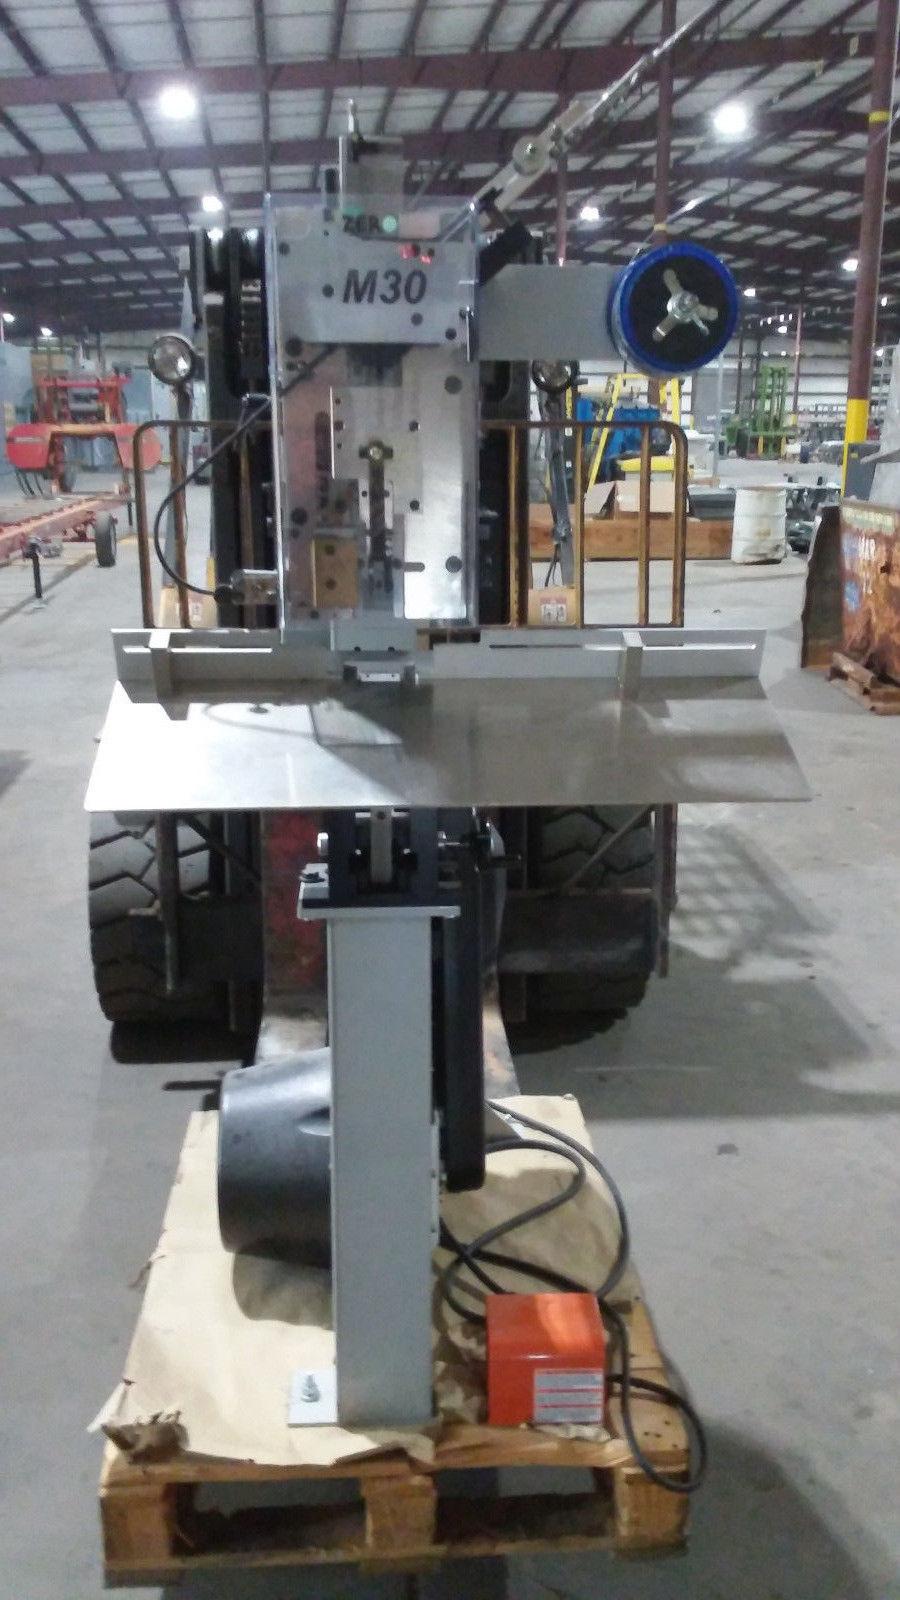 Image DELUXE M30 Stitching Machine  1312304